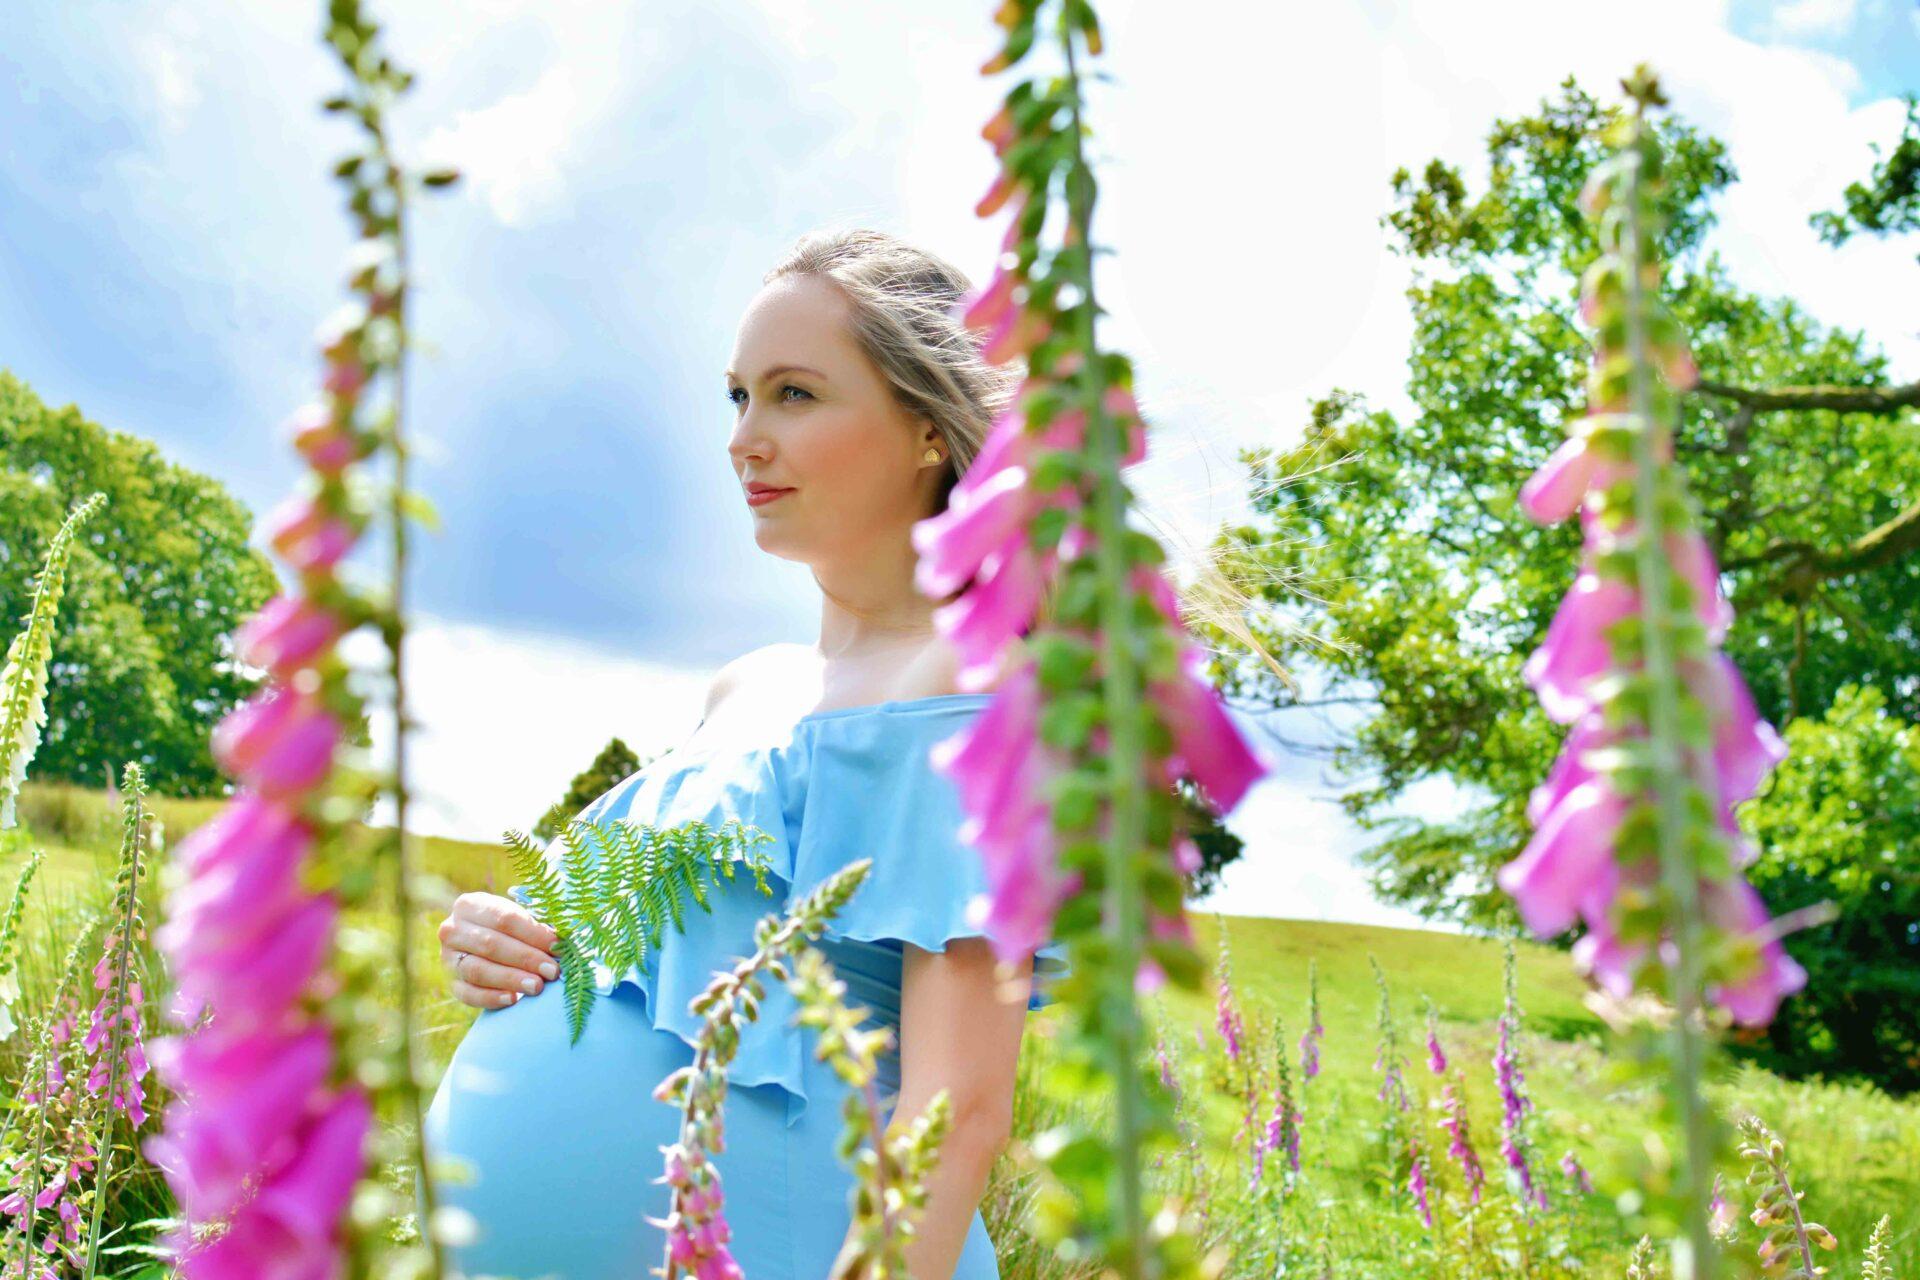 maternity photography in sevenoaks kent